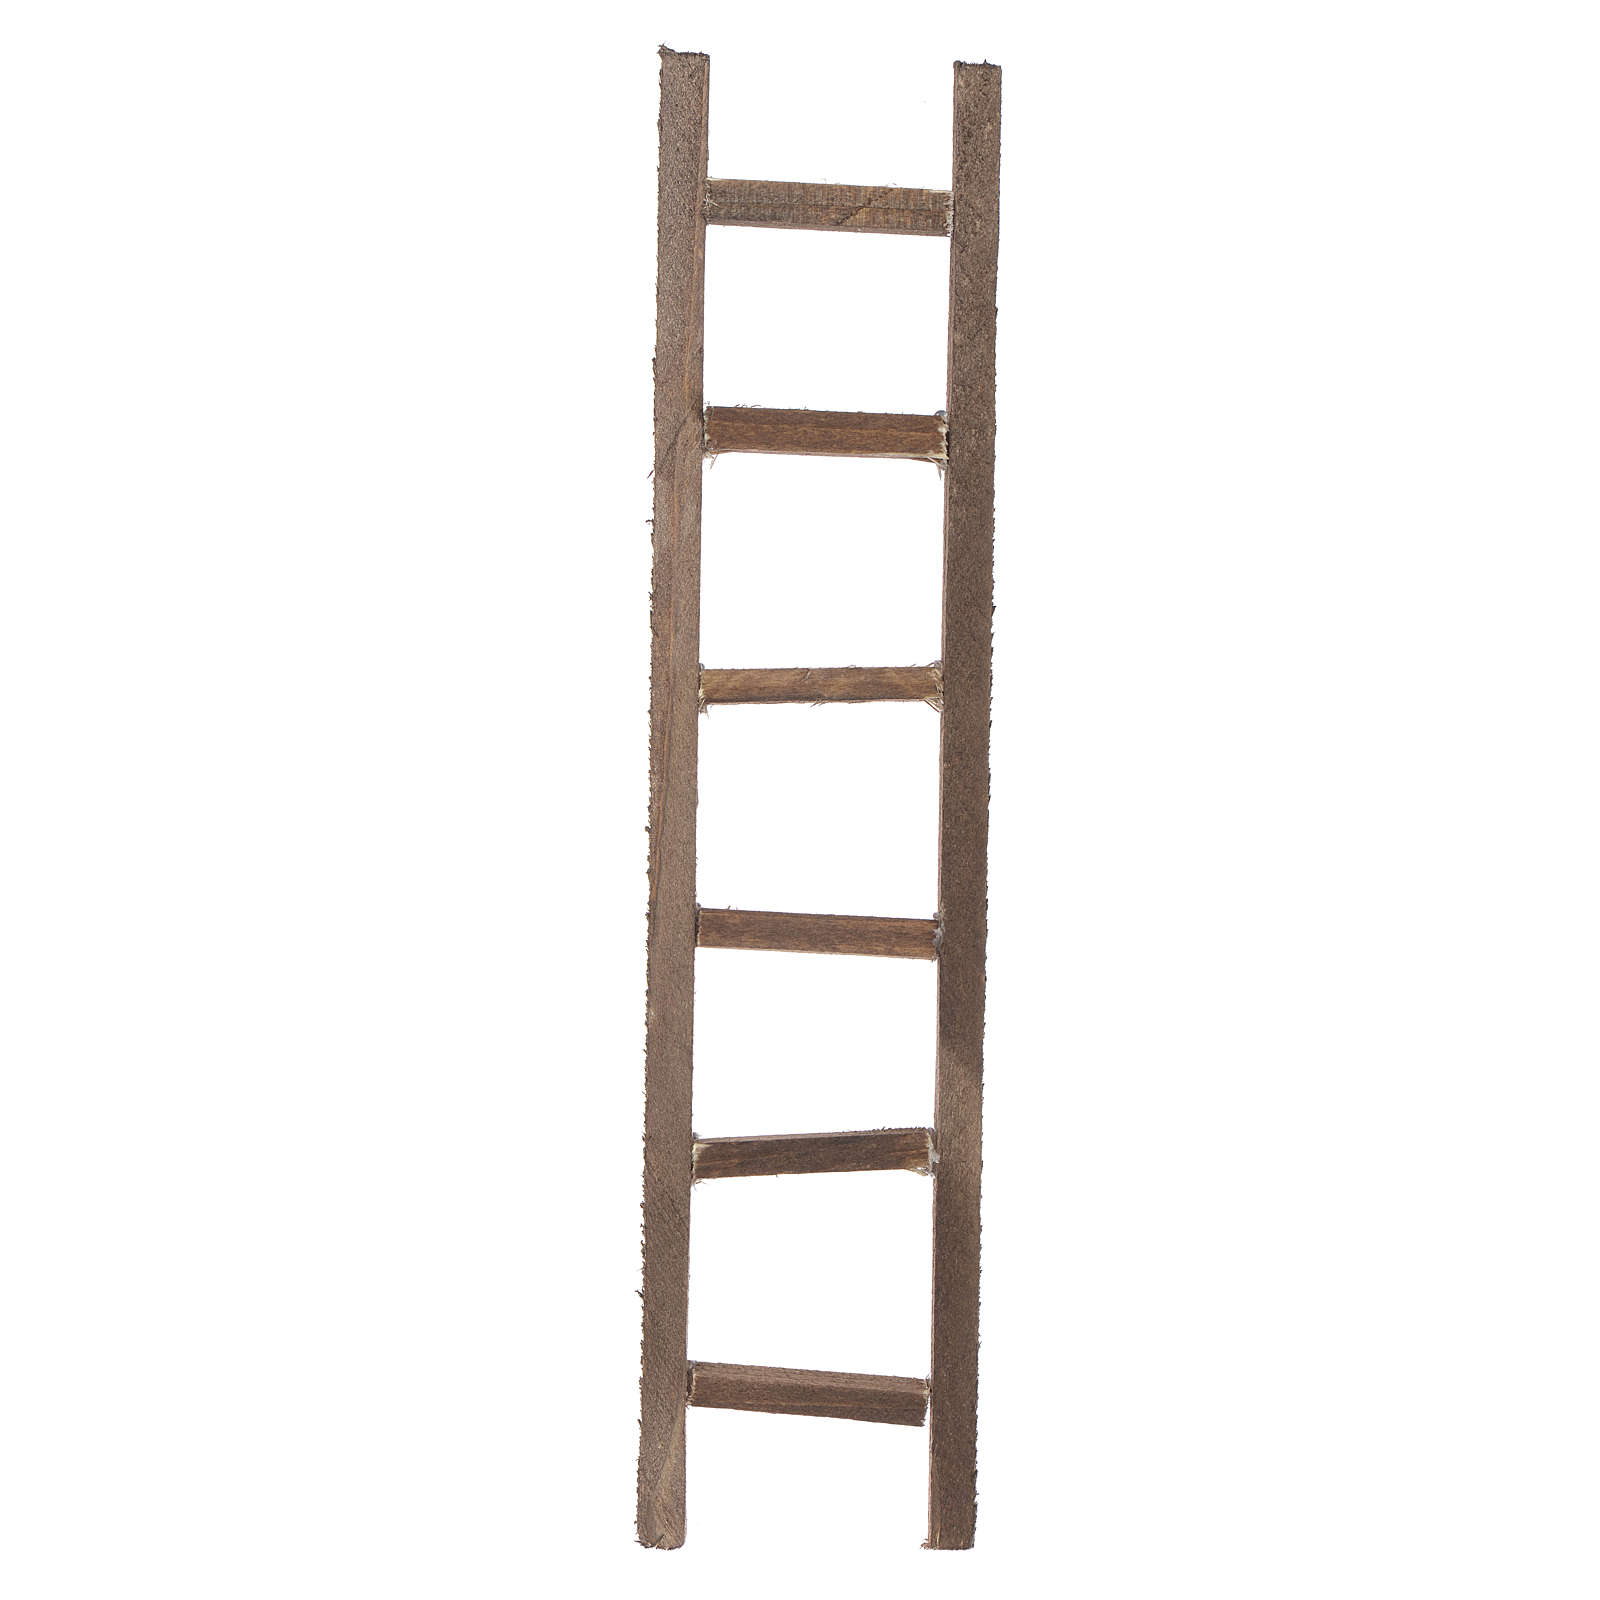 Wooden ladder, nativity accessory 22x4.5cm 4